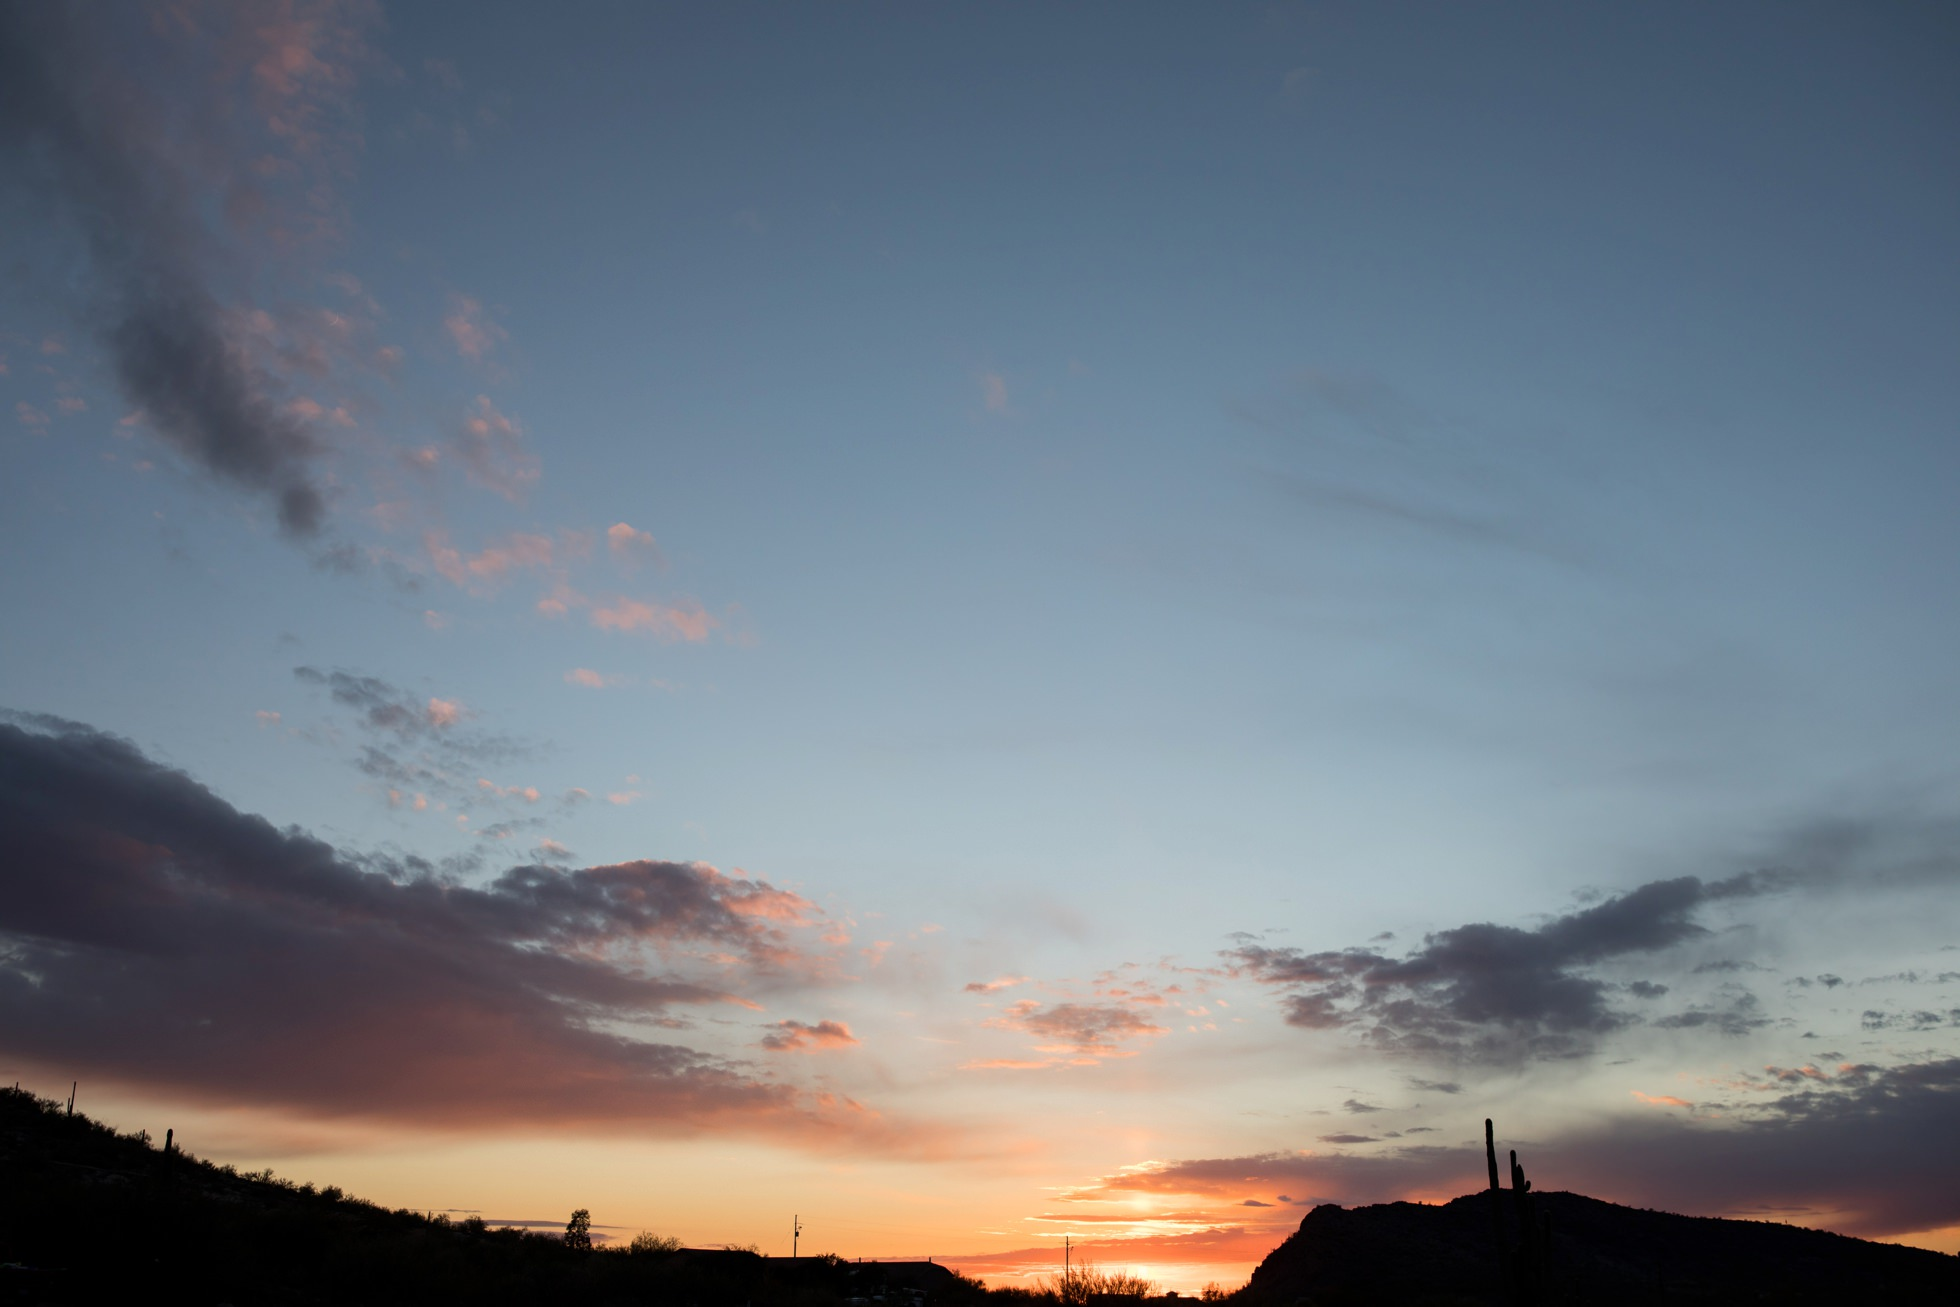 0158-phoenix-arizona-sunset-camelback-mountain-new-river